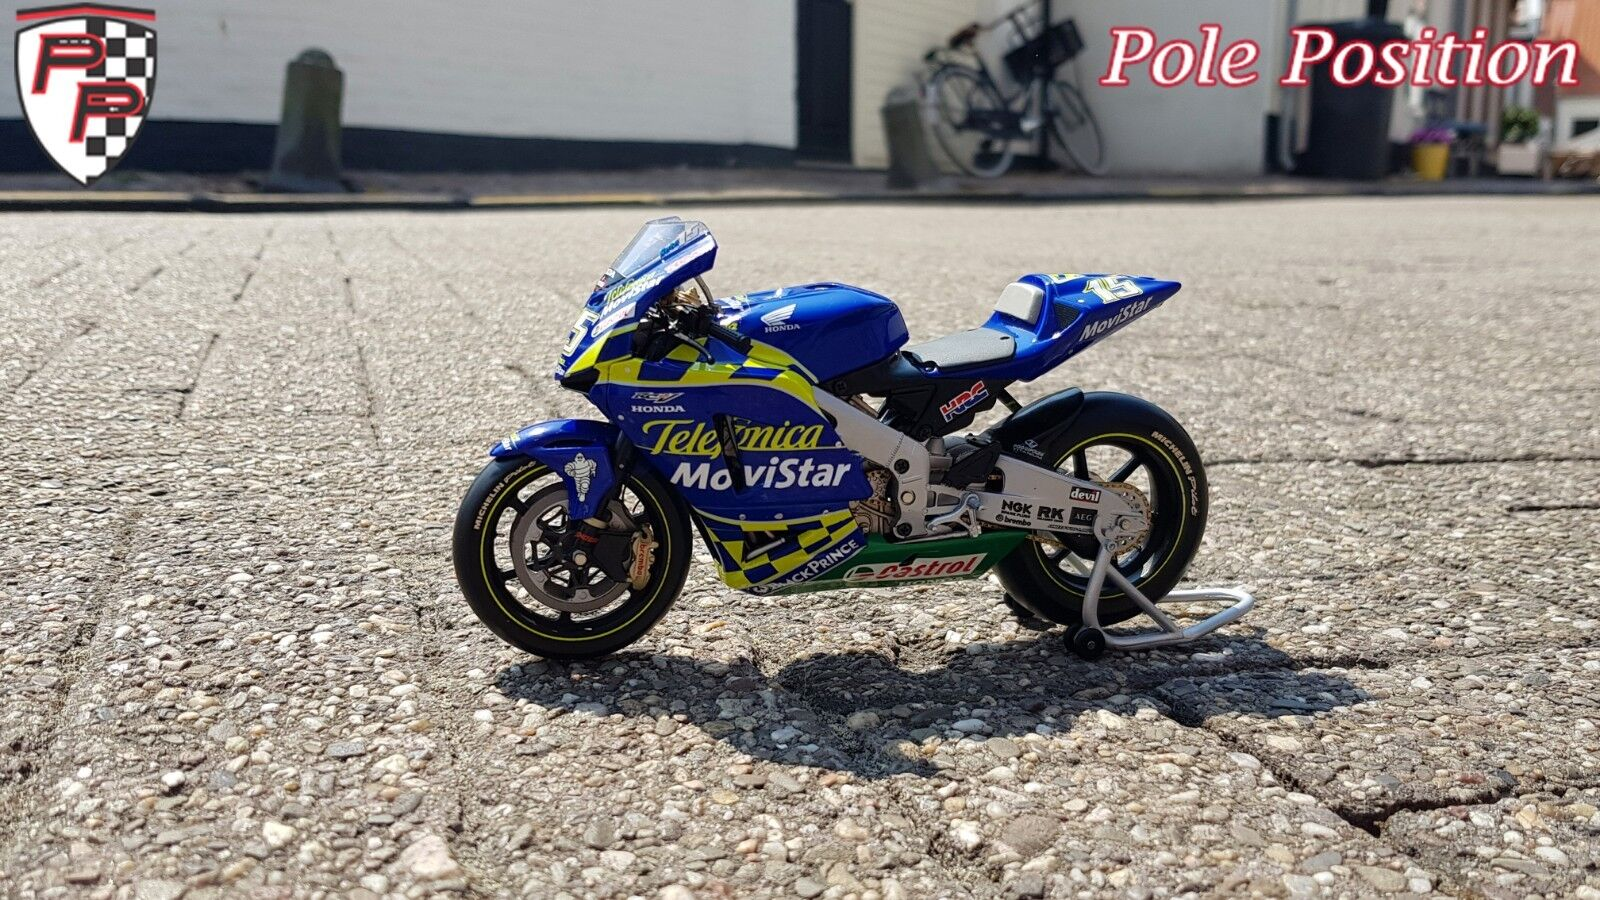 Envíos y devoluciones gratis. 1 12 Honda Honda Honda RC211V Sete Gibernau-Team Telefonica MoviEstrella Honda MotoGP 2004  venderse como panqueques